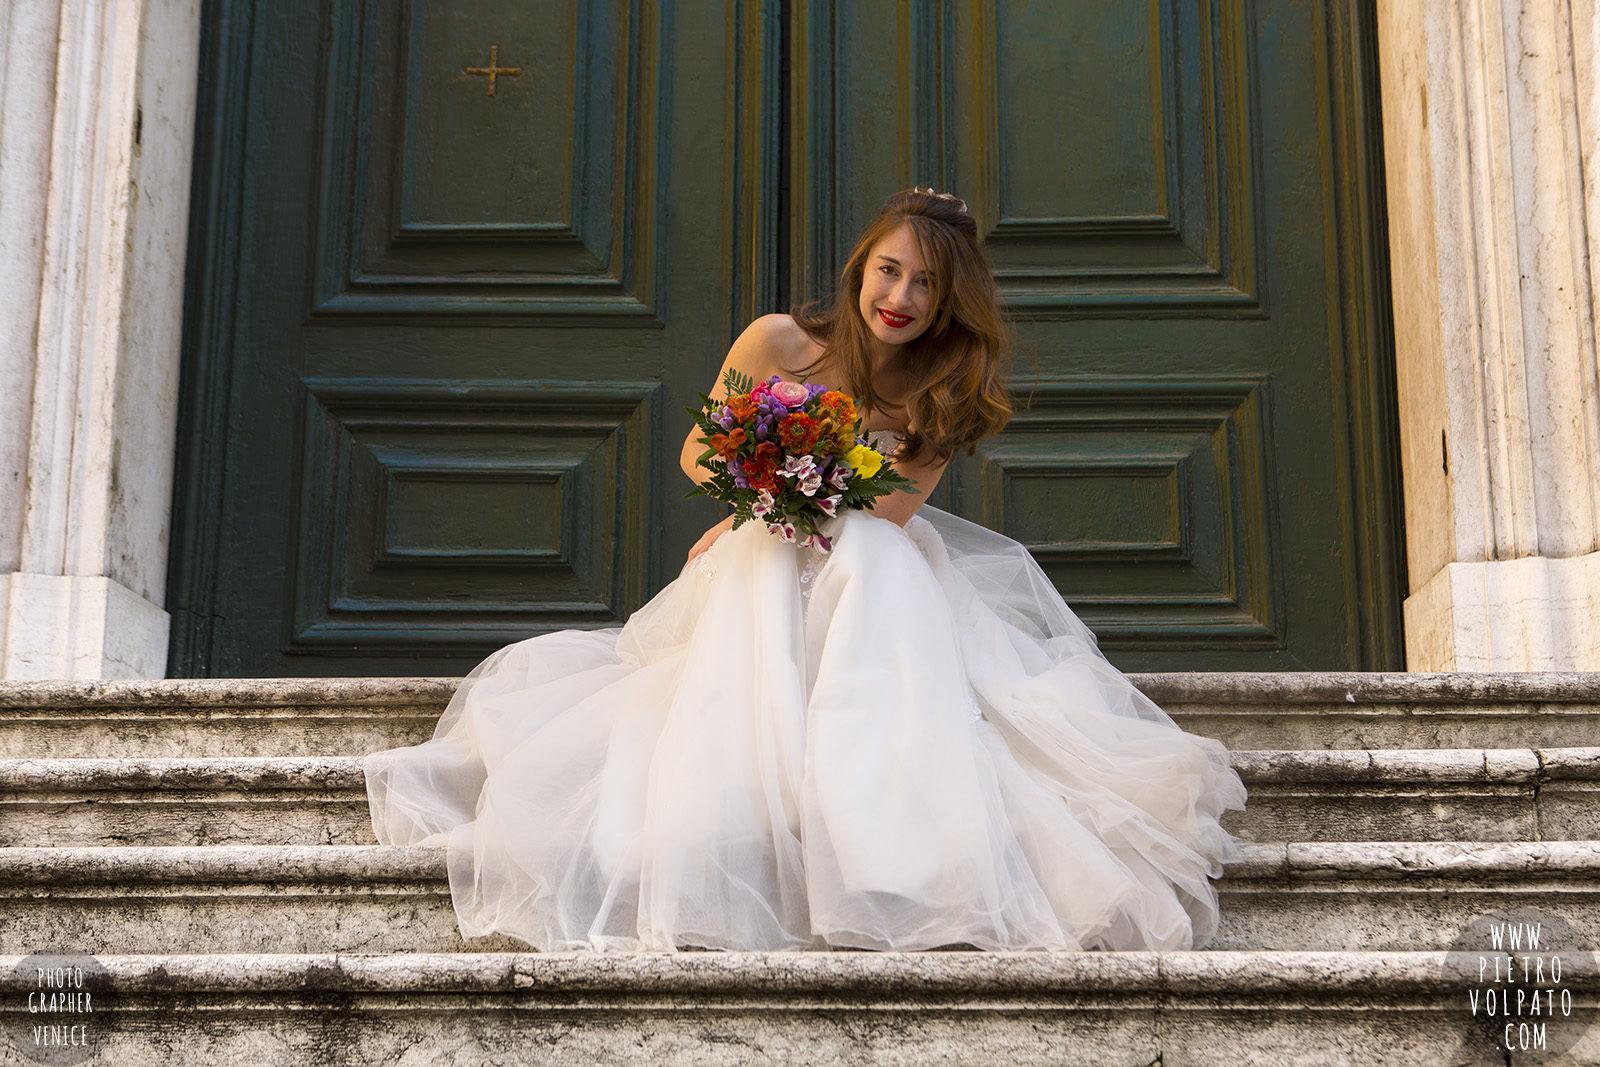 venice-wedding-honeymoon-photographer-20140312_07